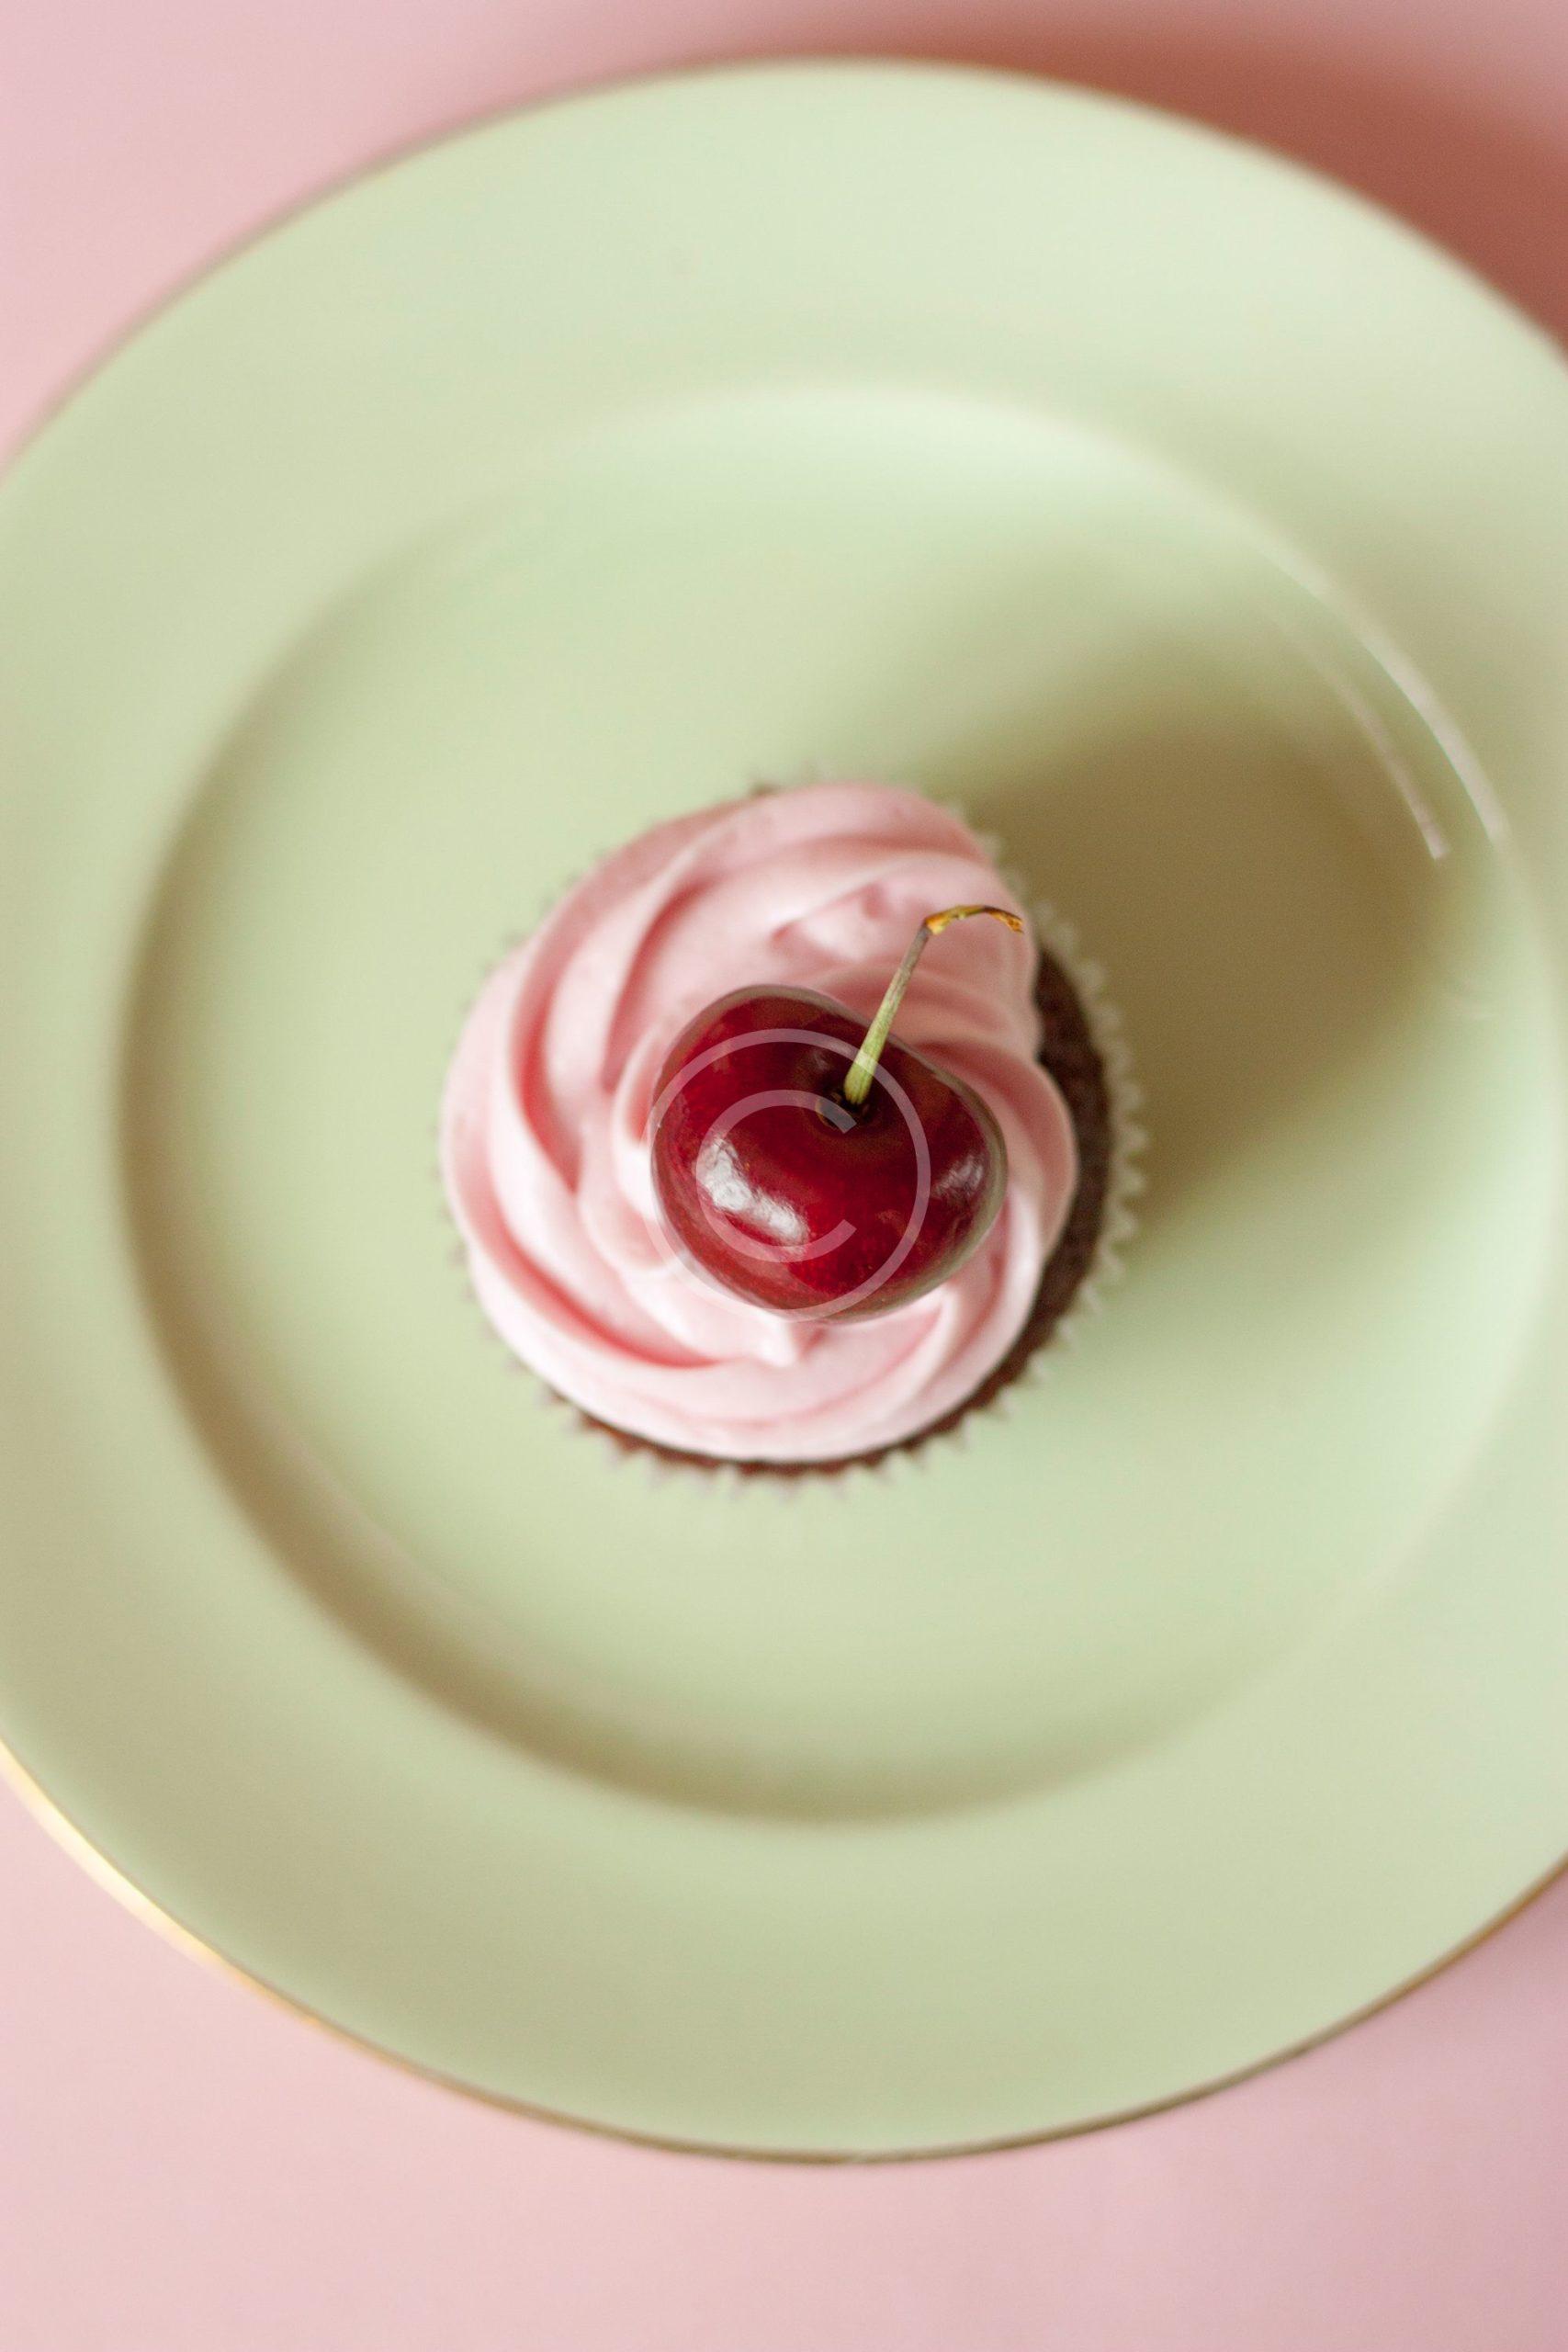 La Dolce Vita: 4 Season Desserts by Italian Guru